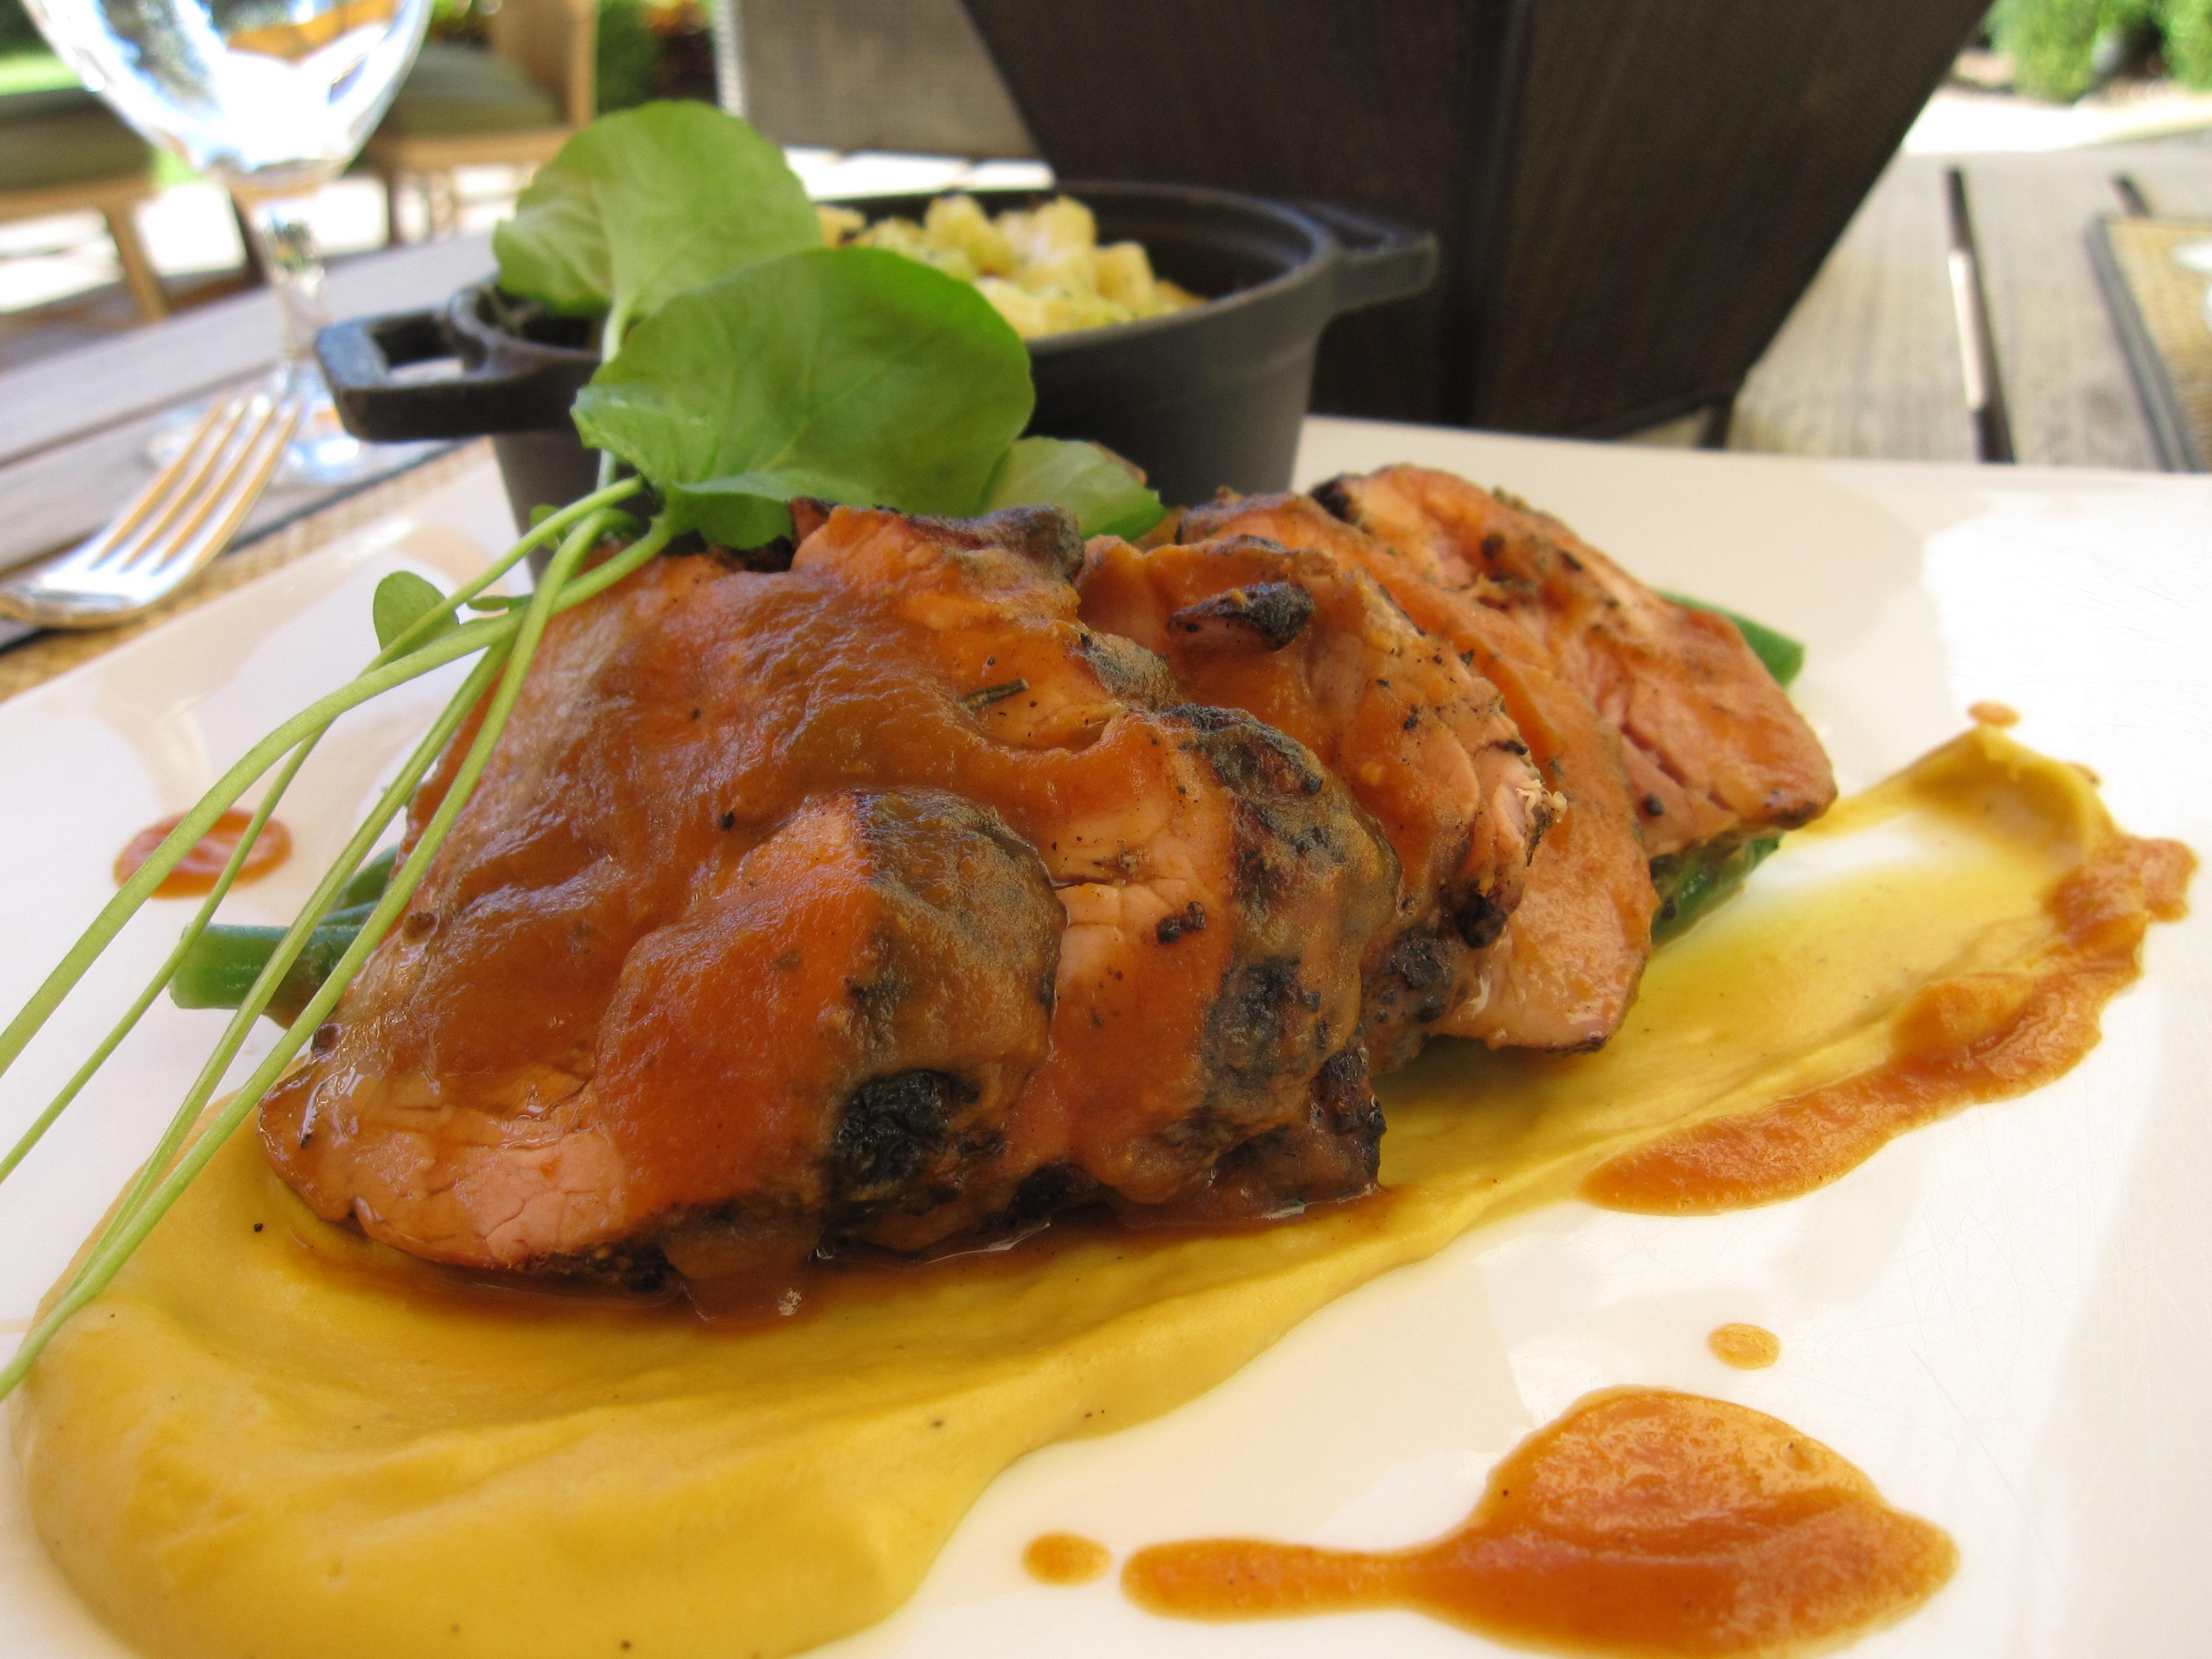 Pork Tenderloin With Maple Mustard Sauce Recipes — Dishmaps